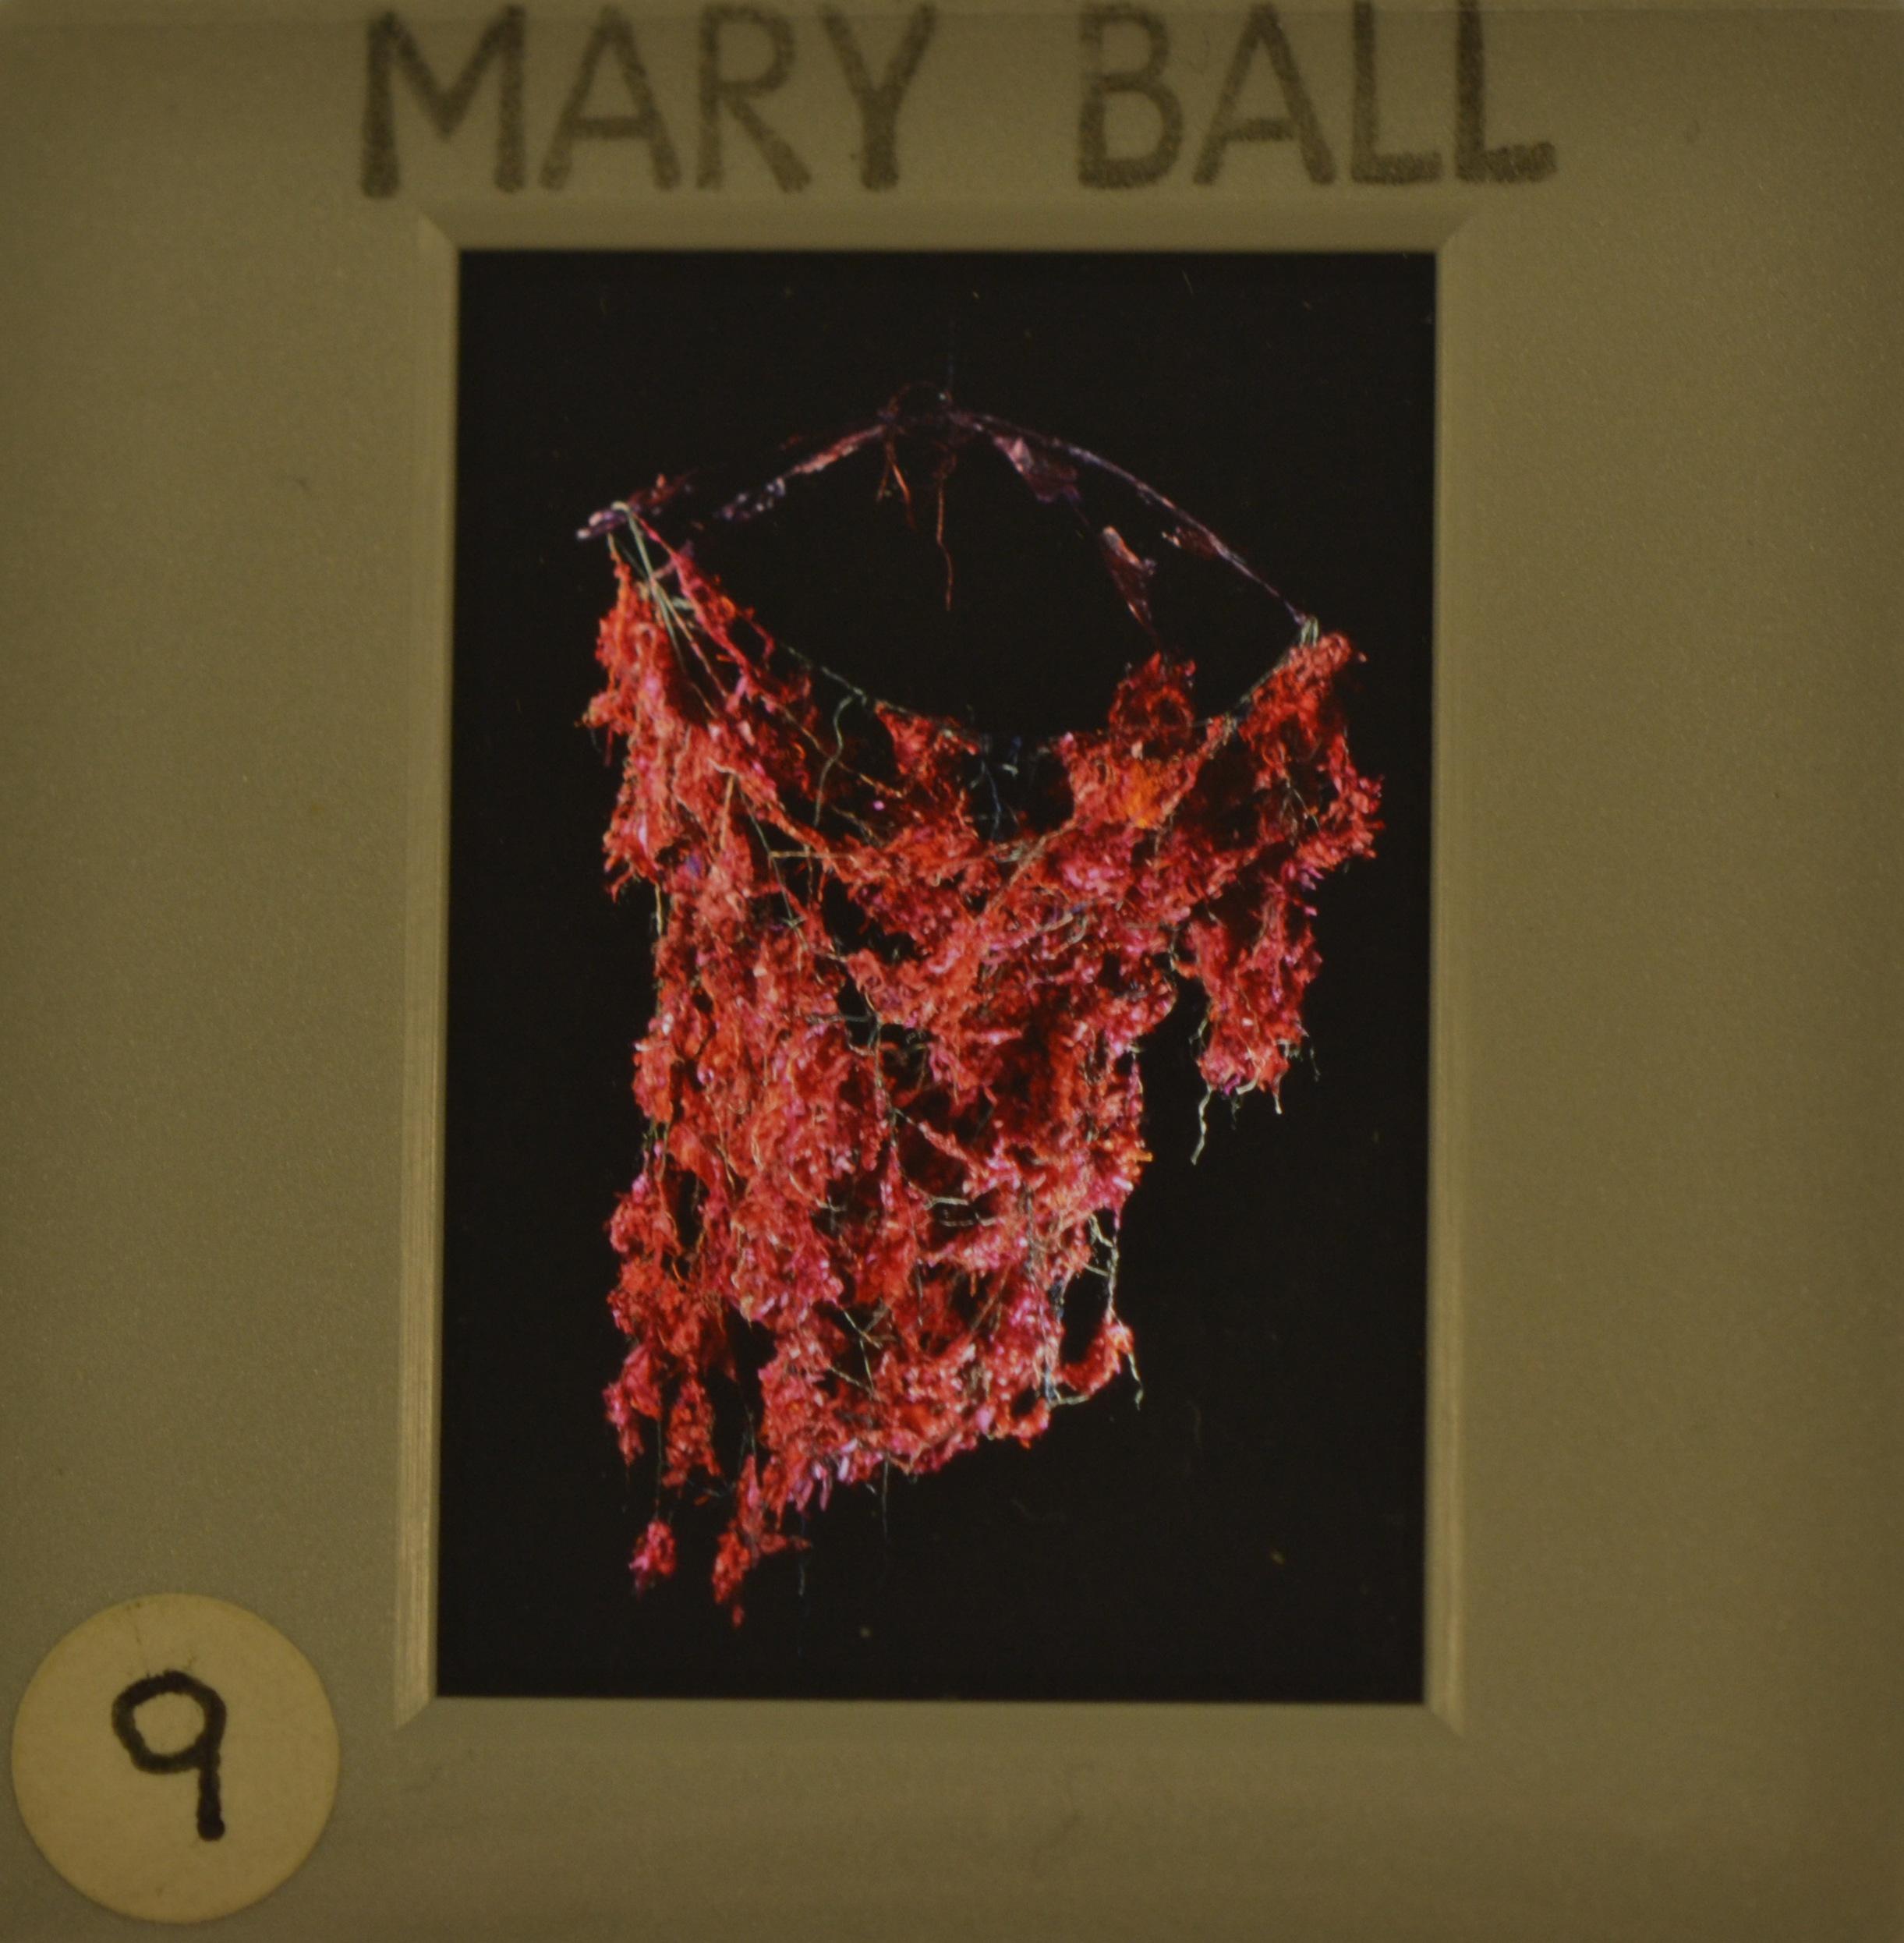 MARY BALL S2004.jpg